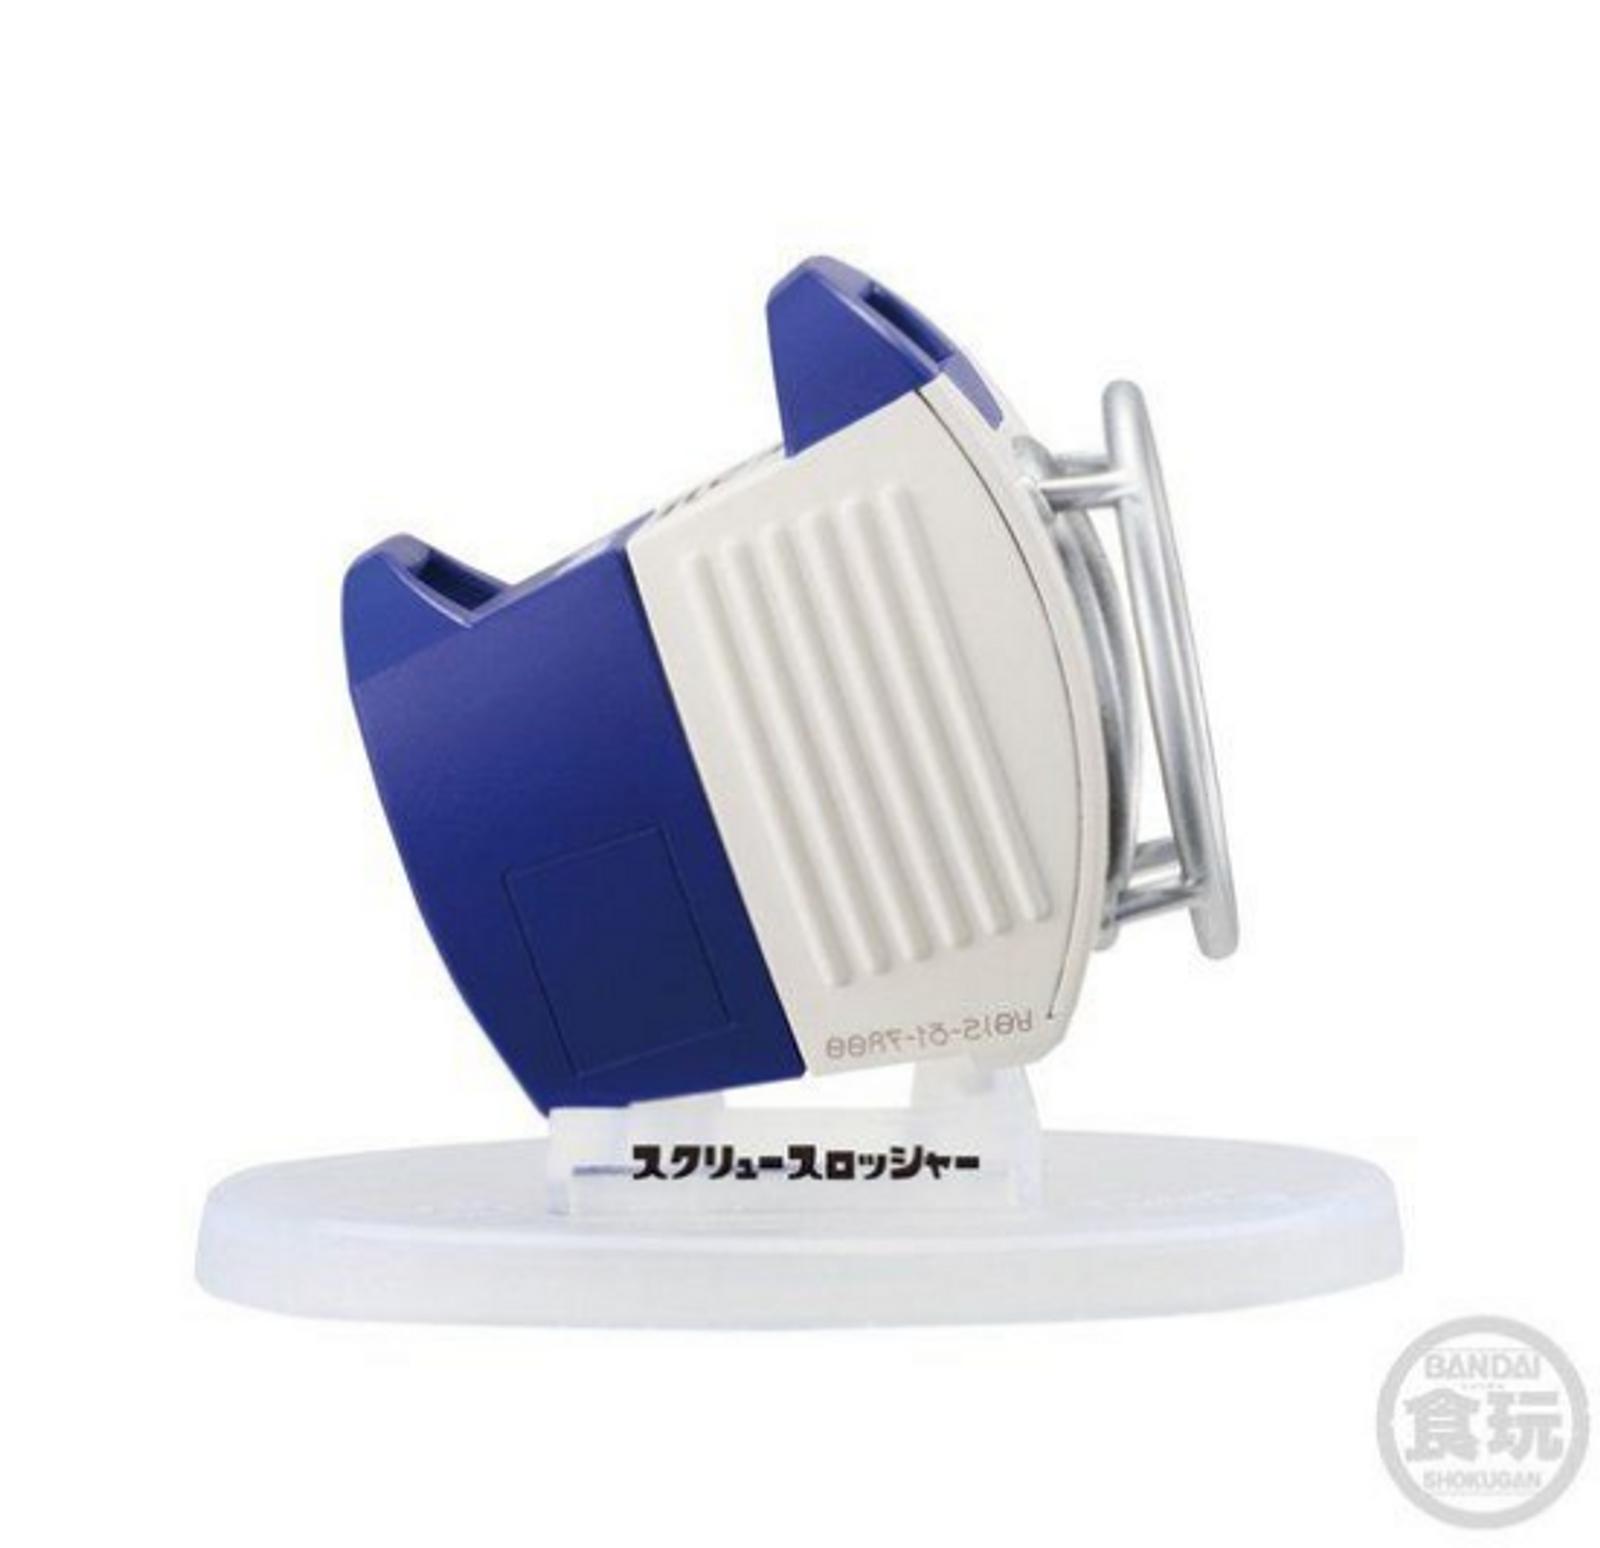 Splatoon 2 Sloshing Machine Weapon Figure Collection JAPAN Nintendo Switch